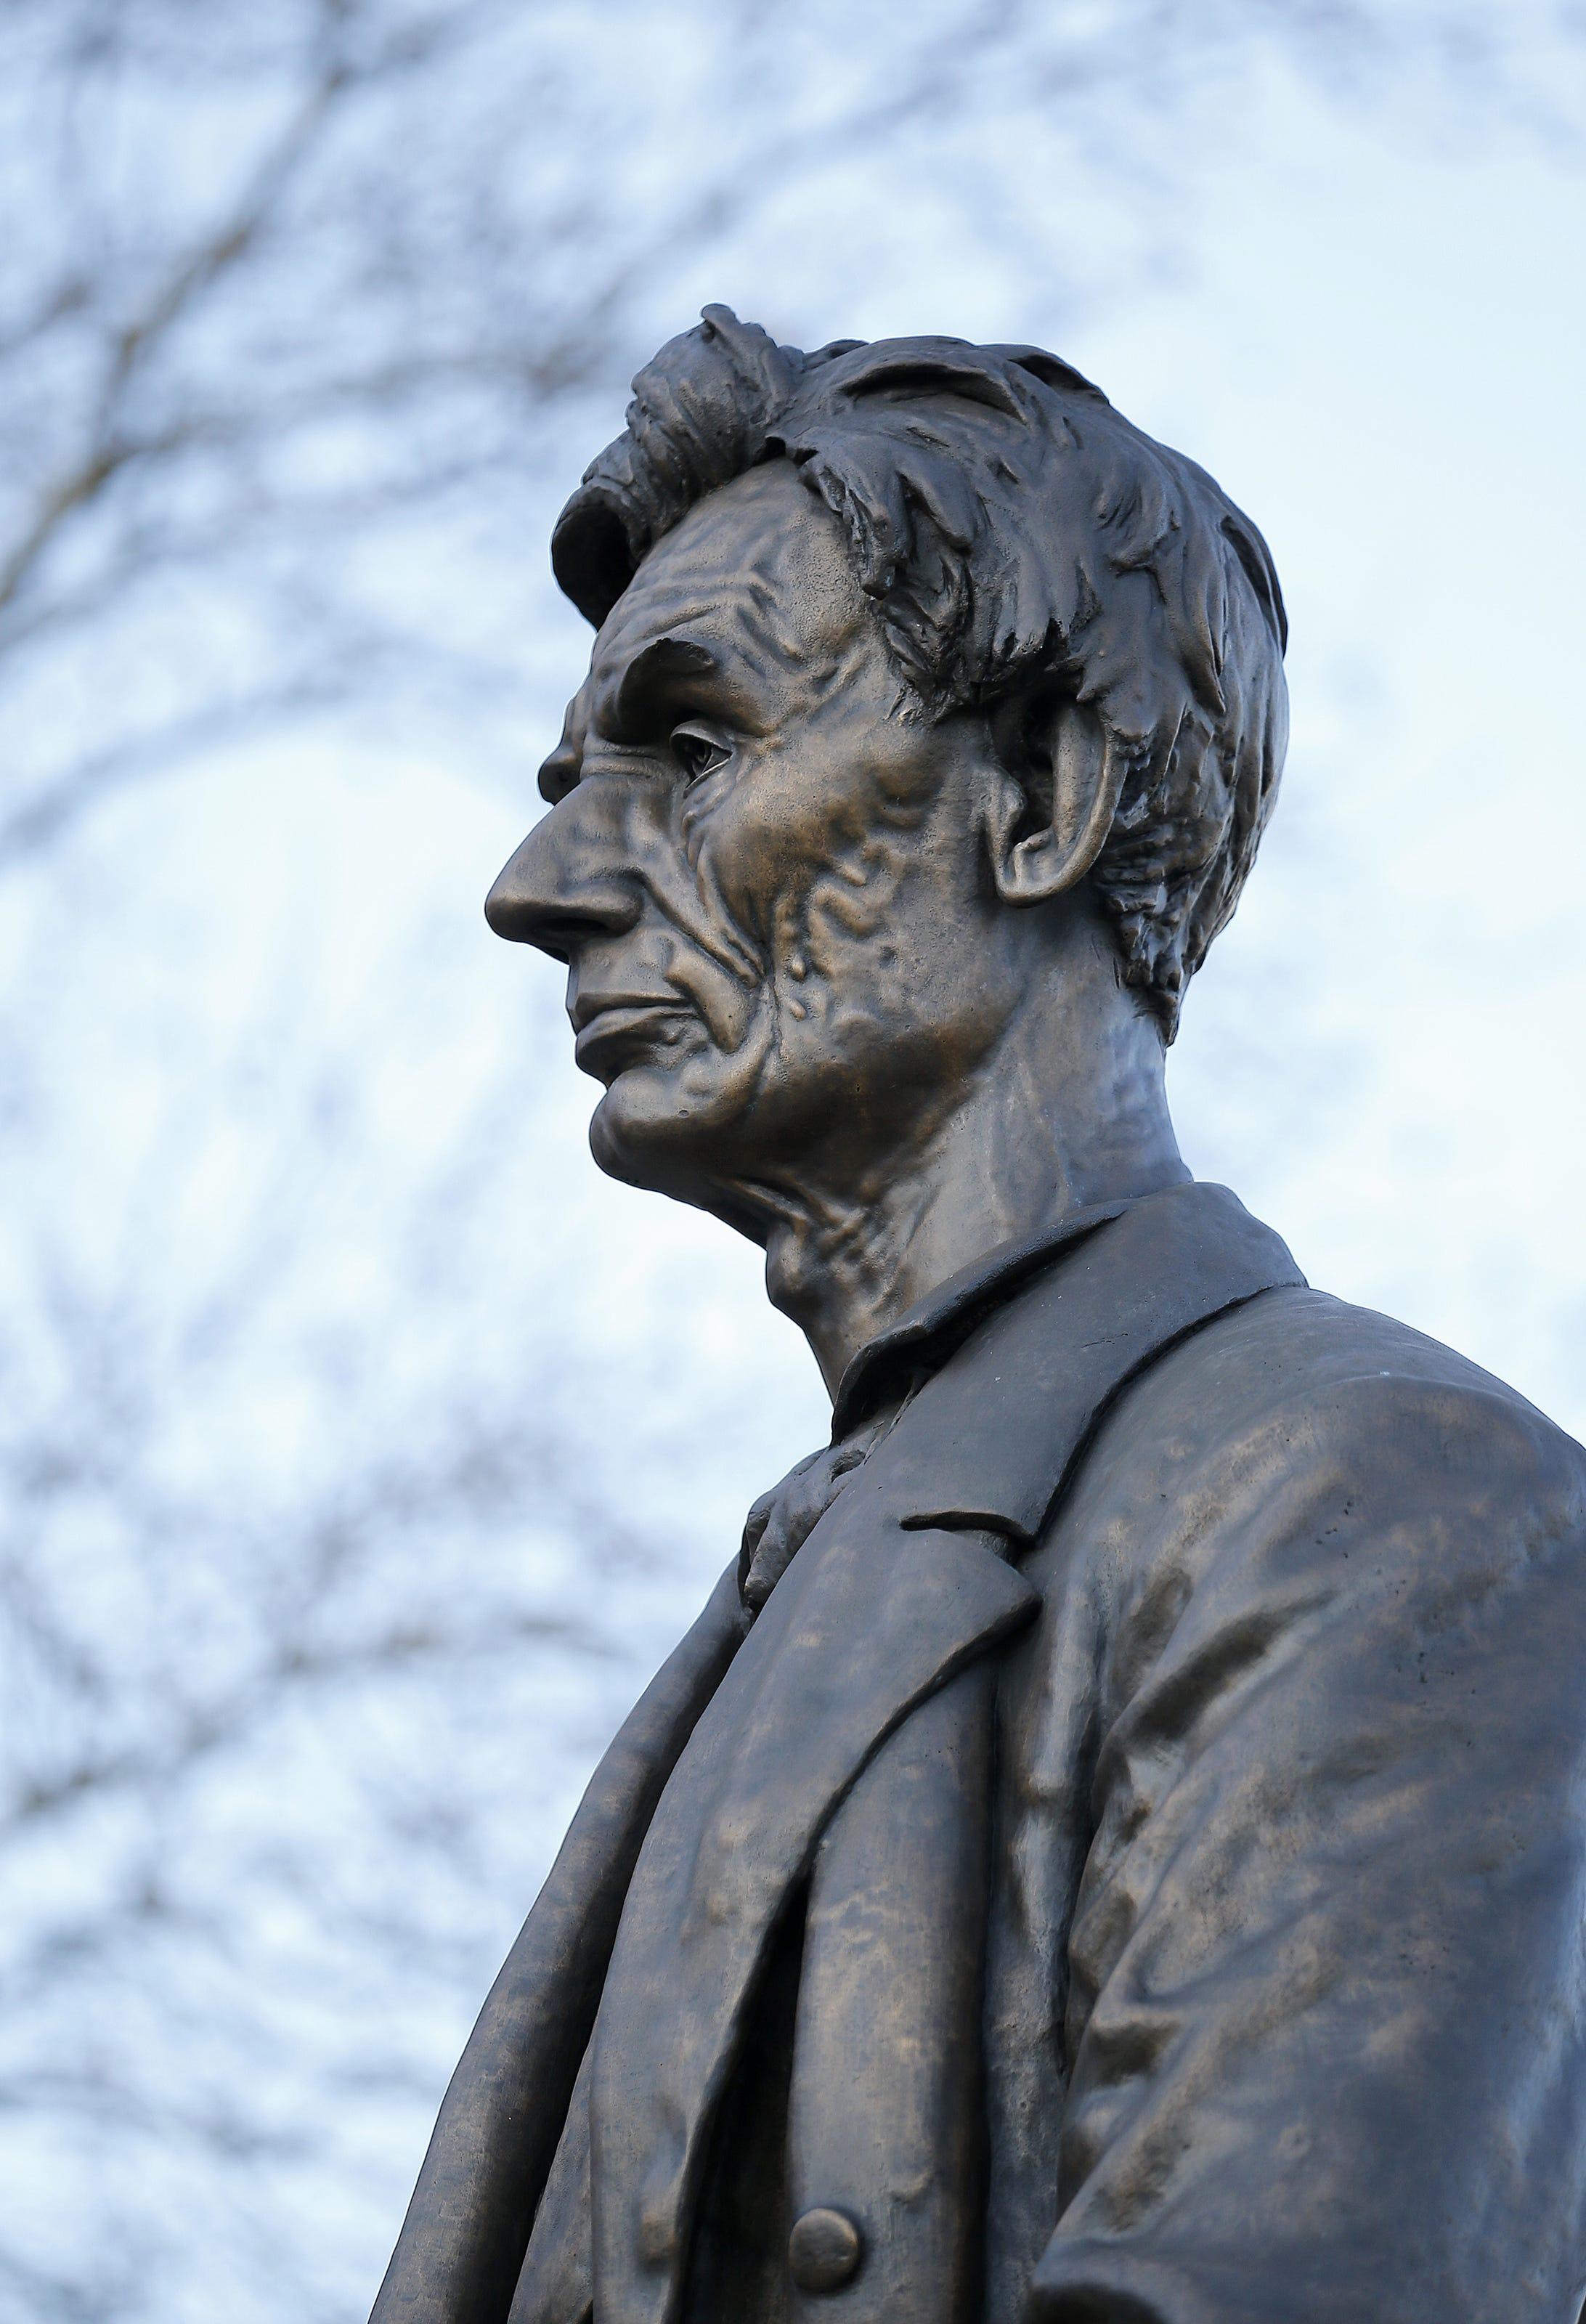 President Statues Of Lincoln Taft Garfield And Harrison In Cincinnati